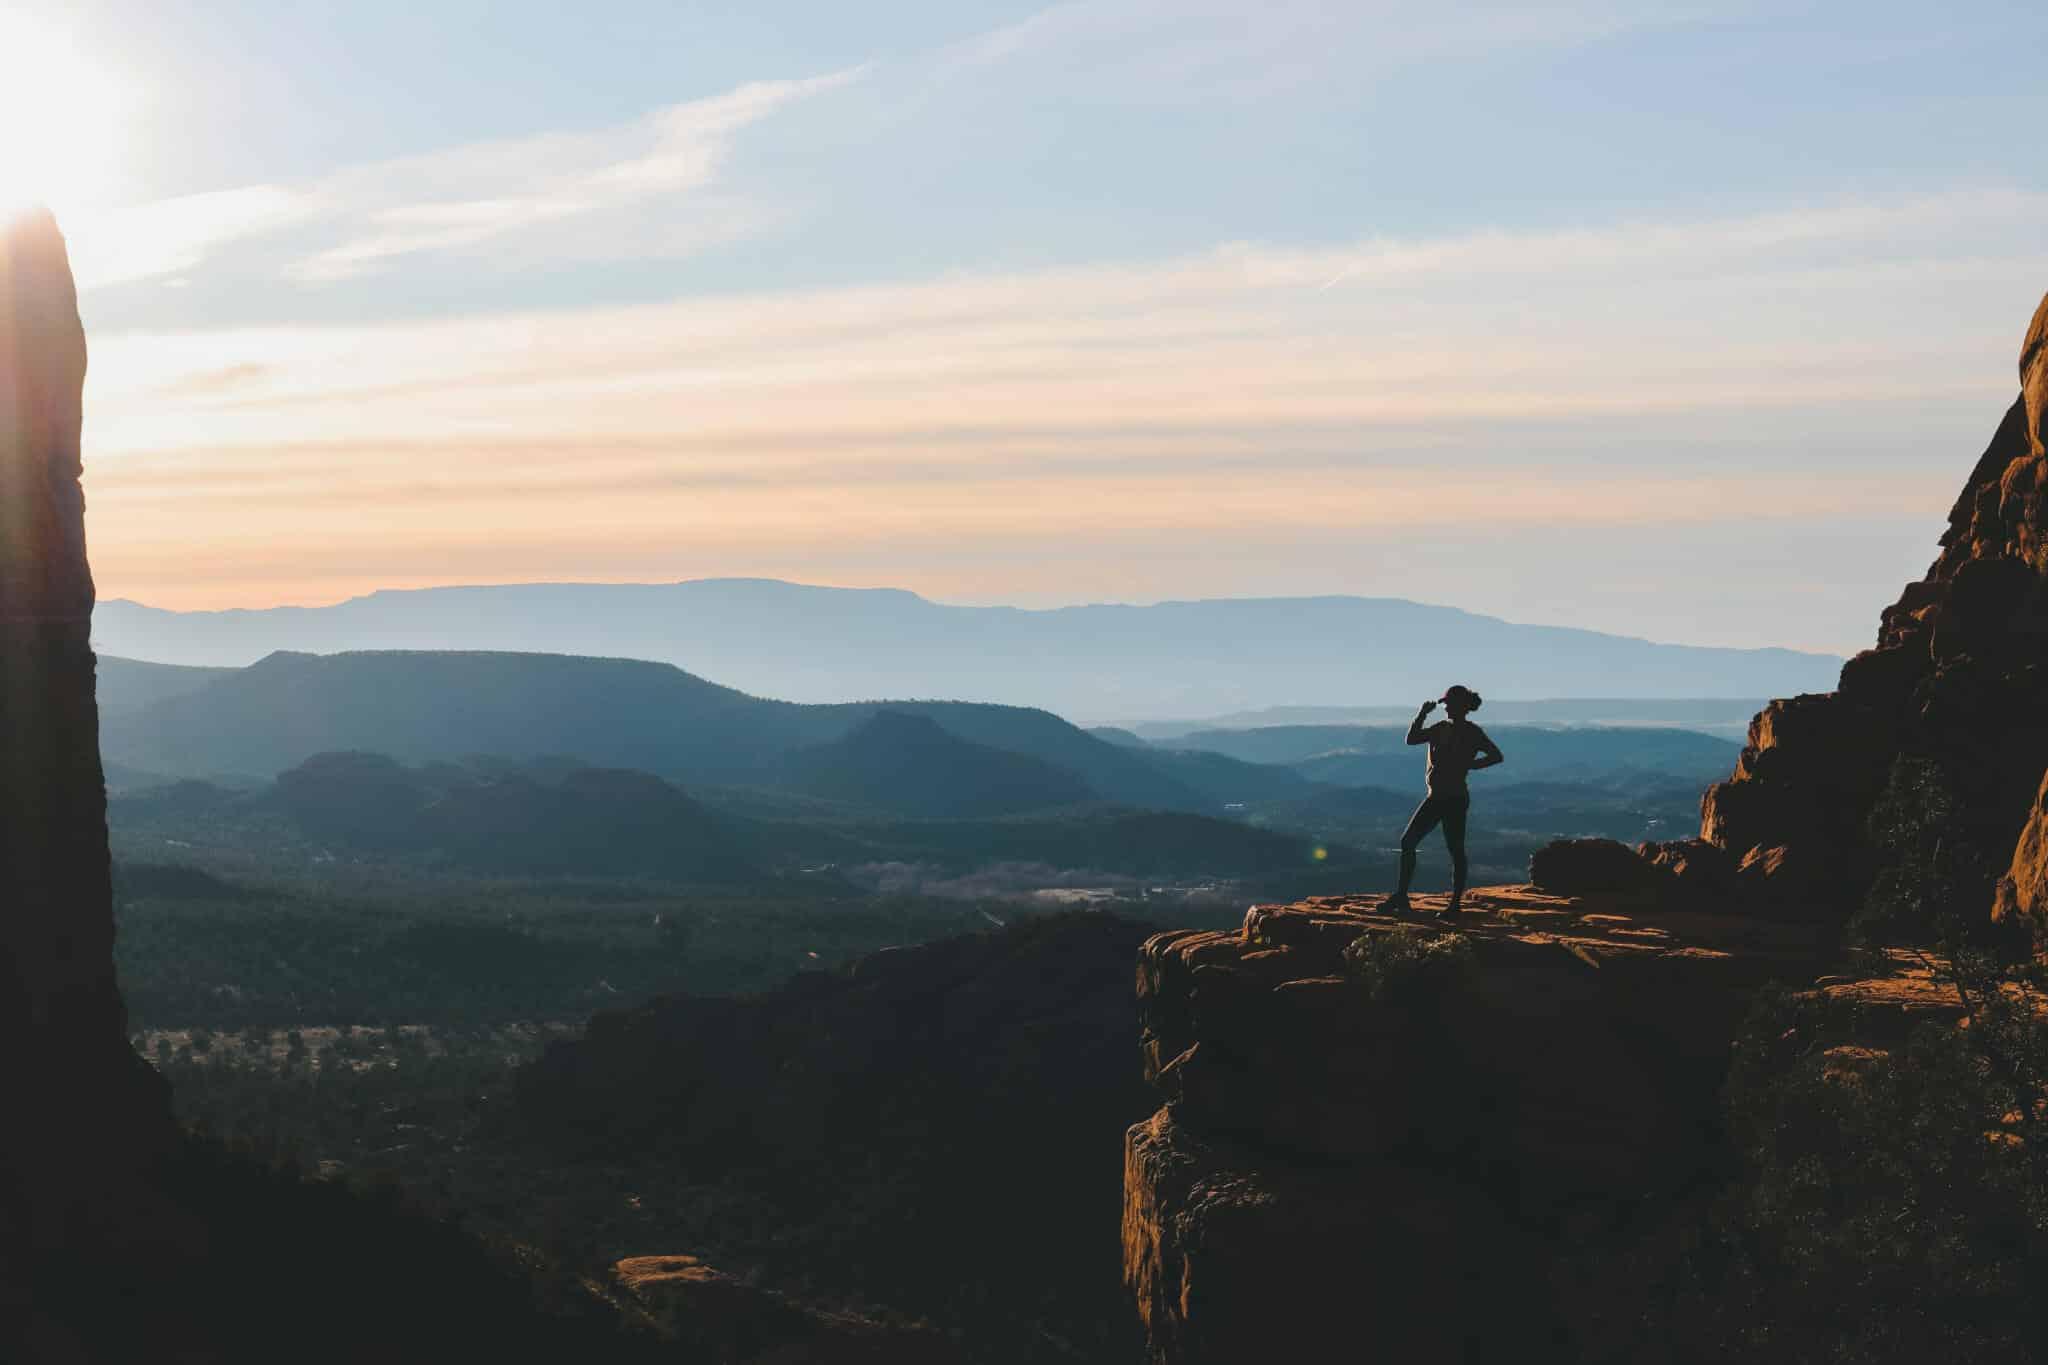 Sedona Itinerary: An In-Depth Sedona Travel Guide